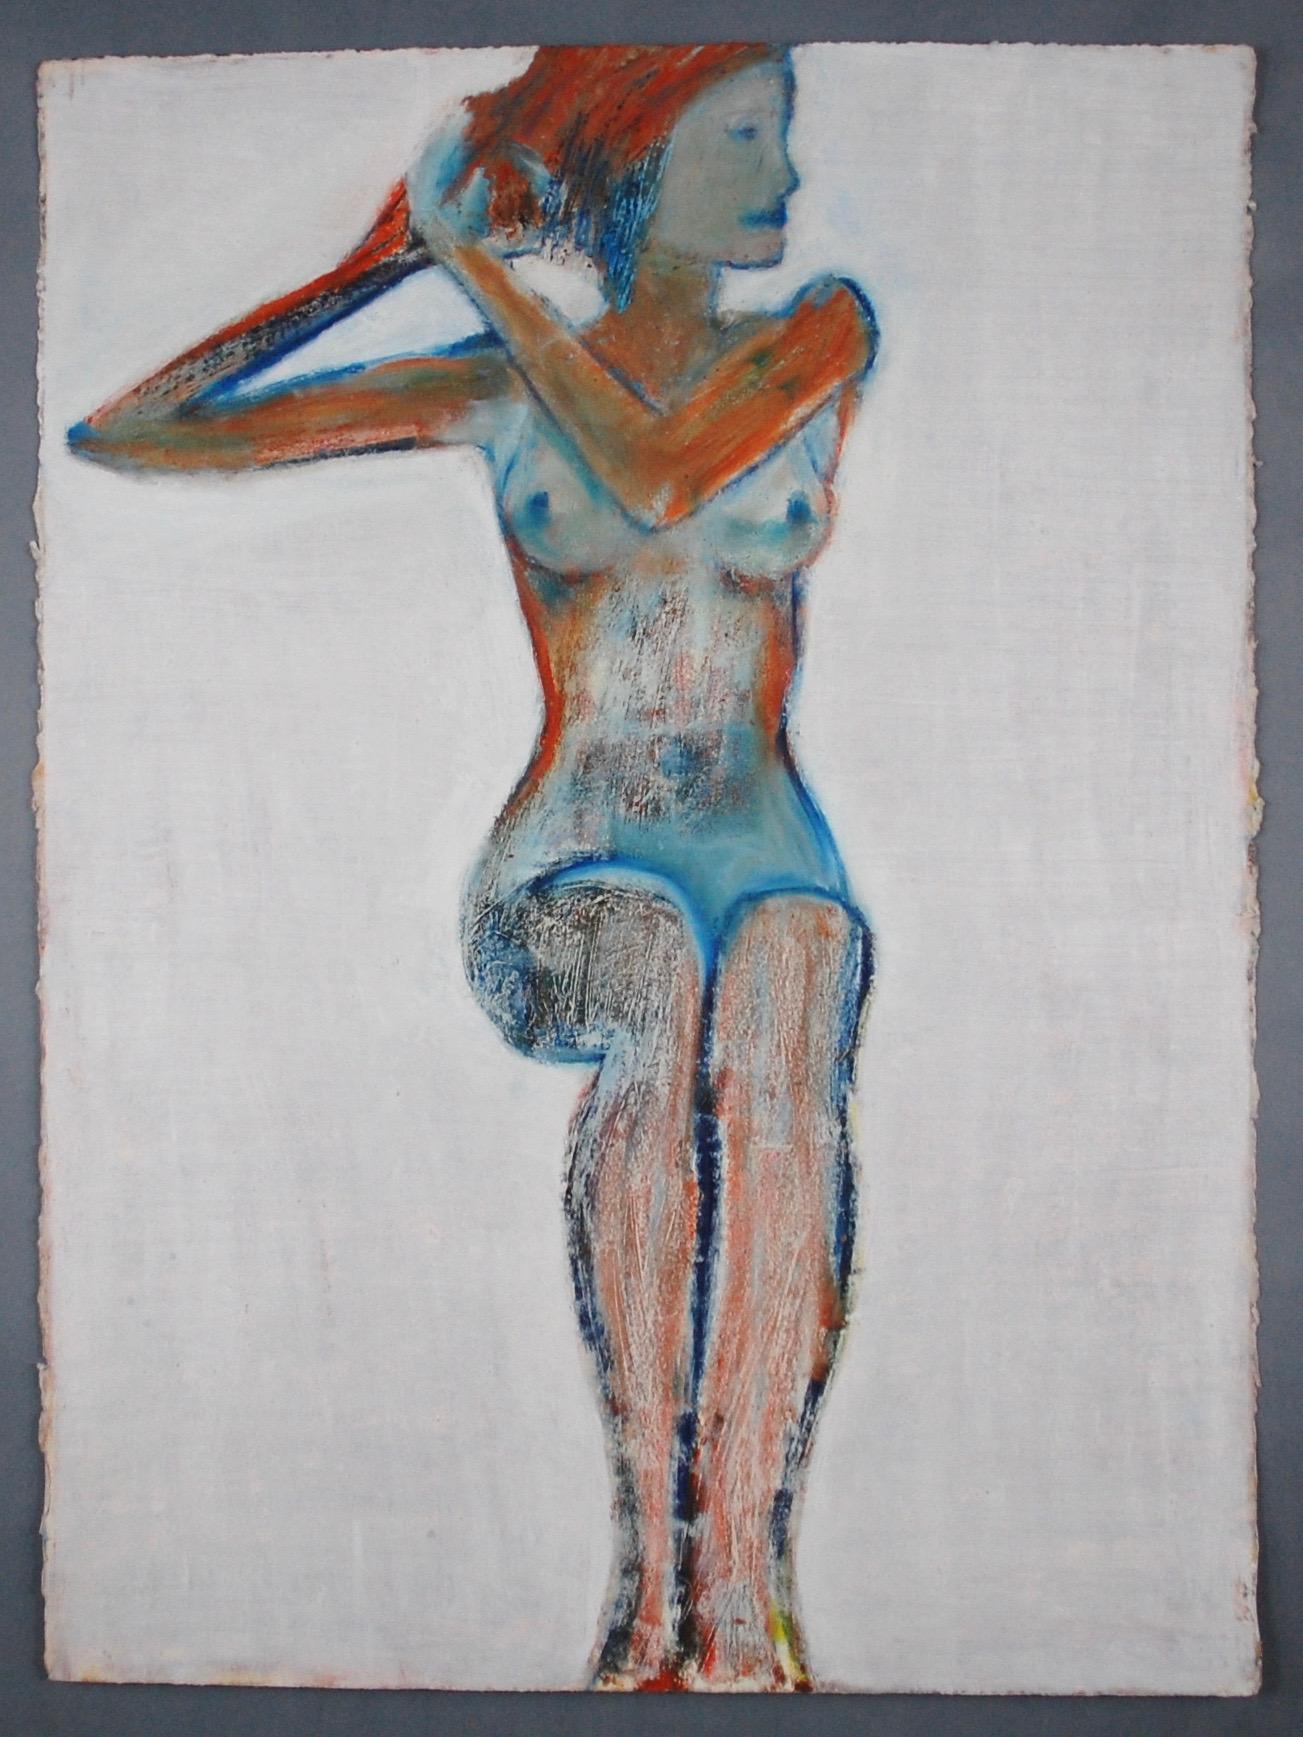 Seated female nude #2 after Schiele